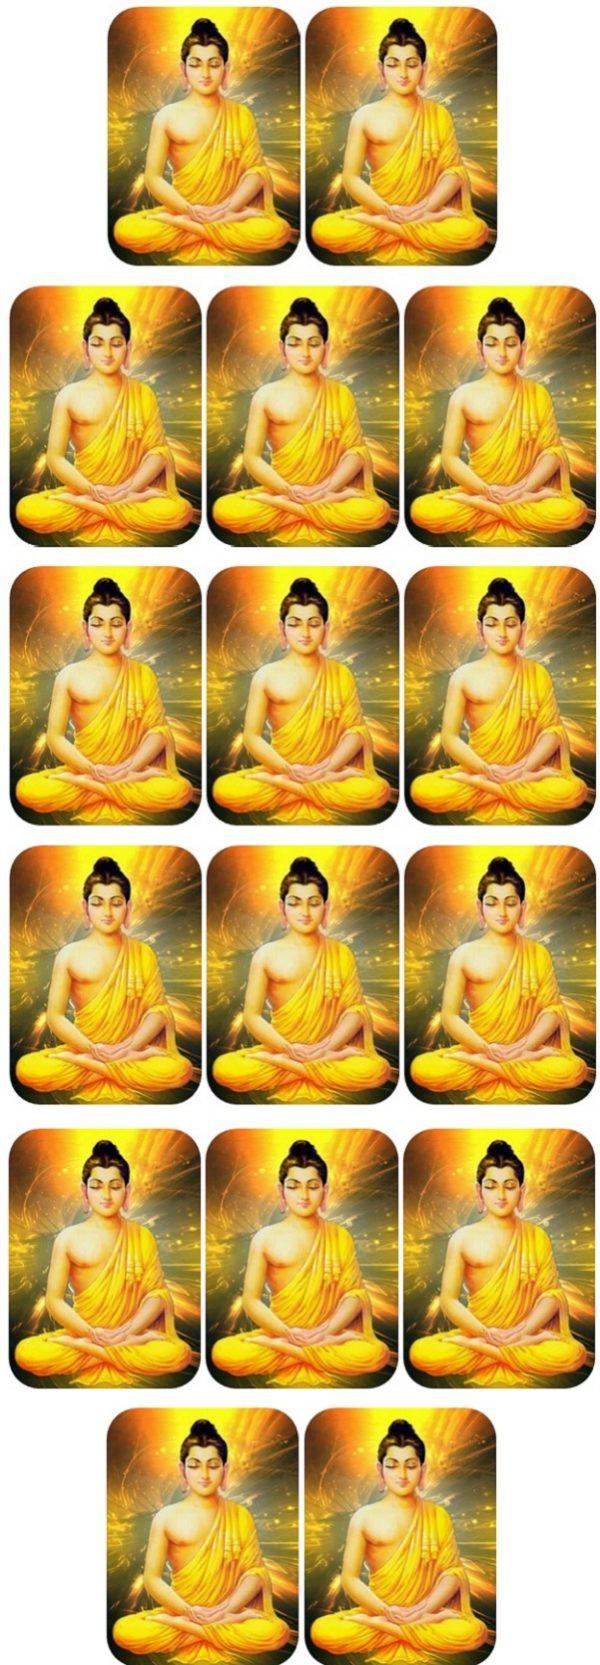 buddhaüzi